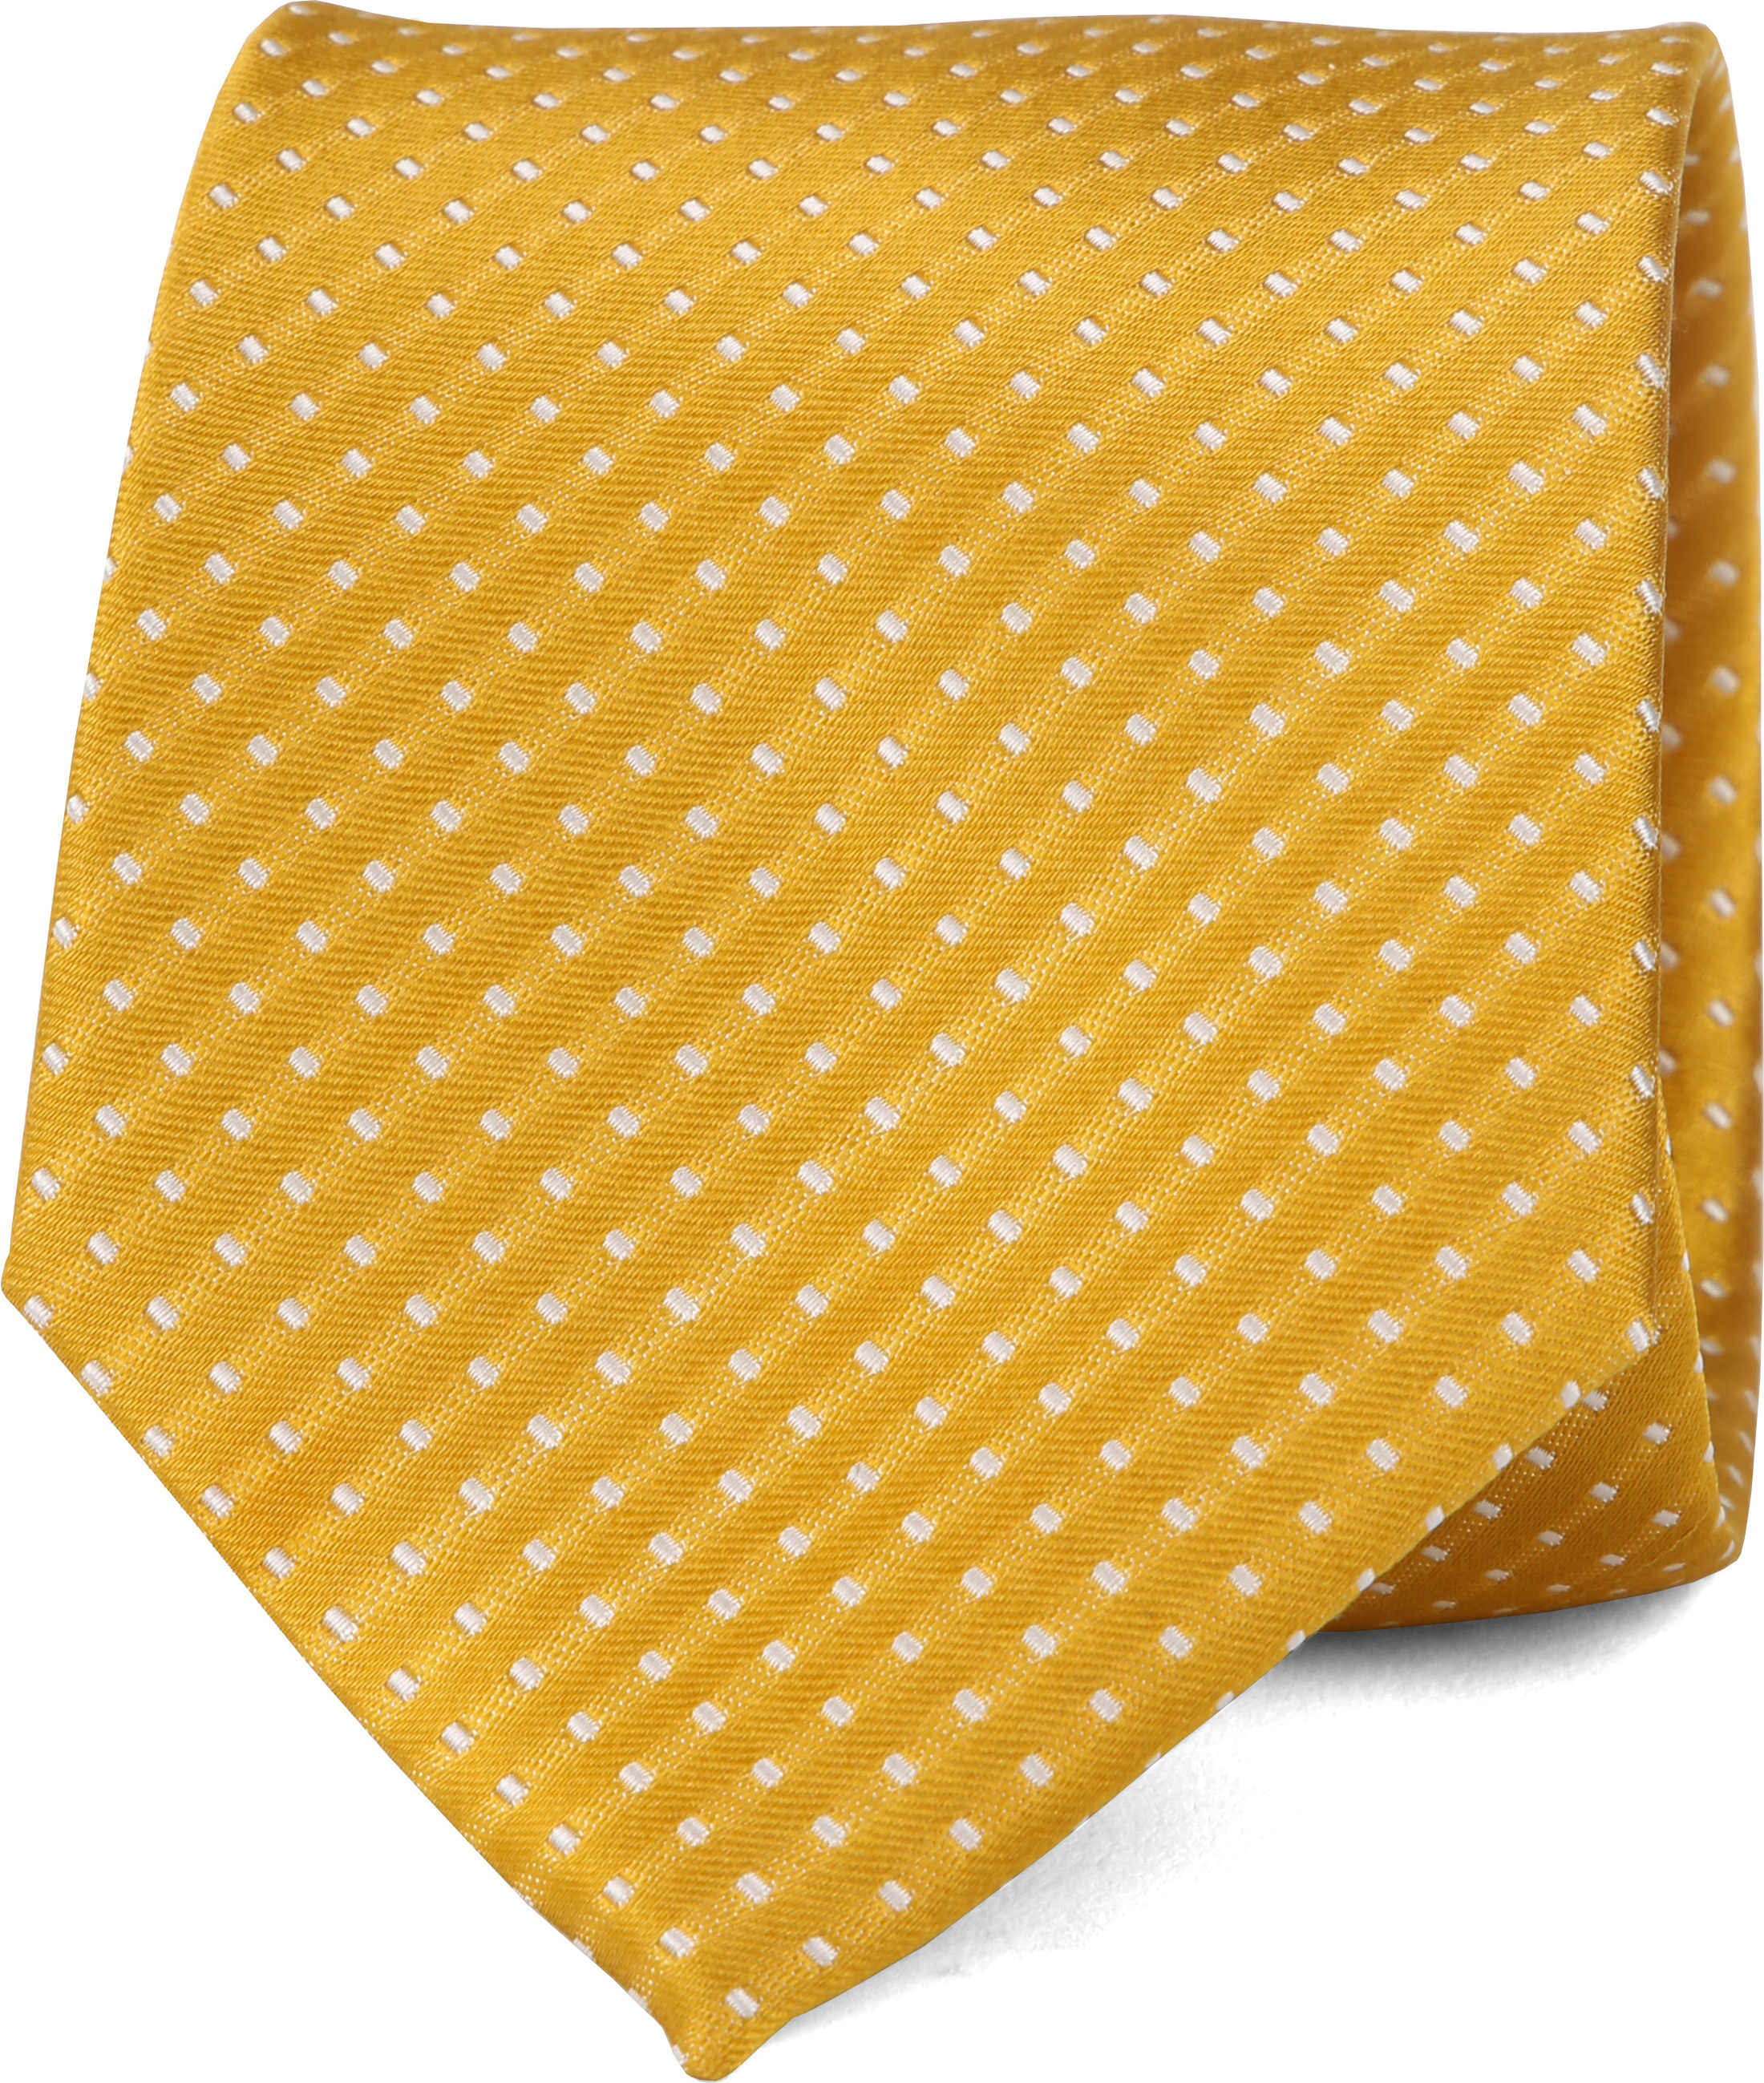 Suitable Krawatte Seide Gelb F91-4 foto 0